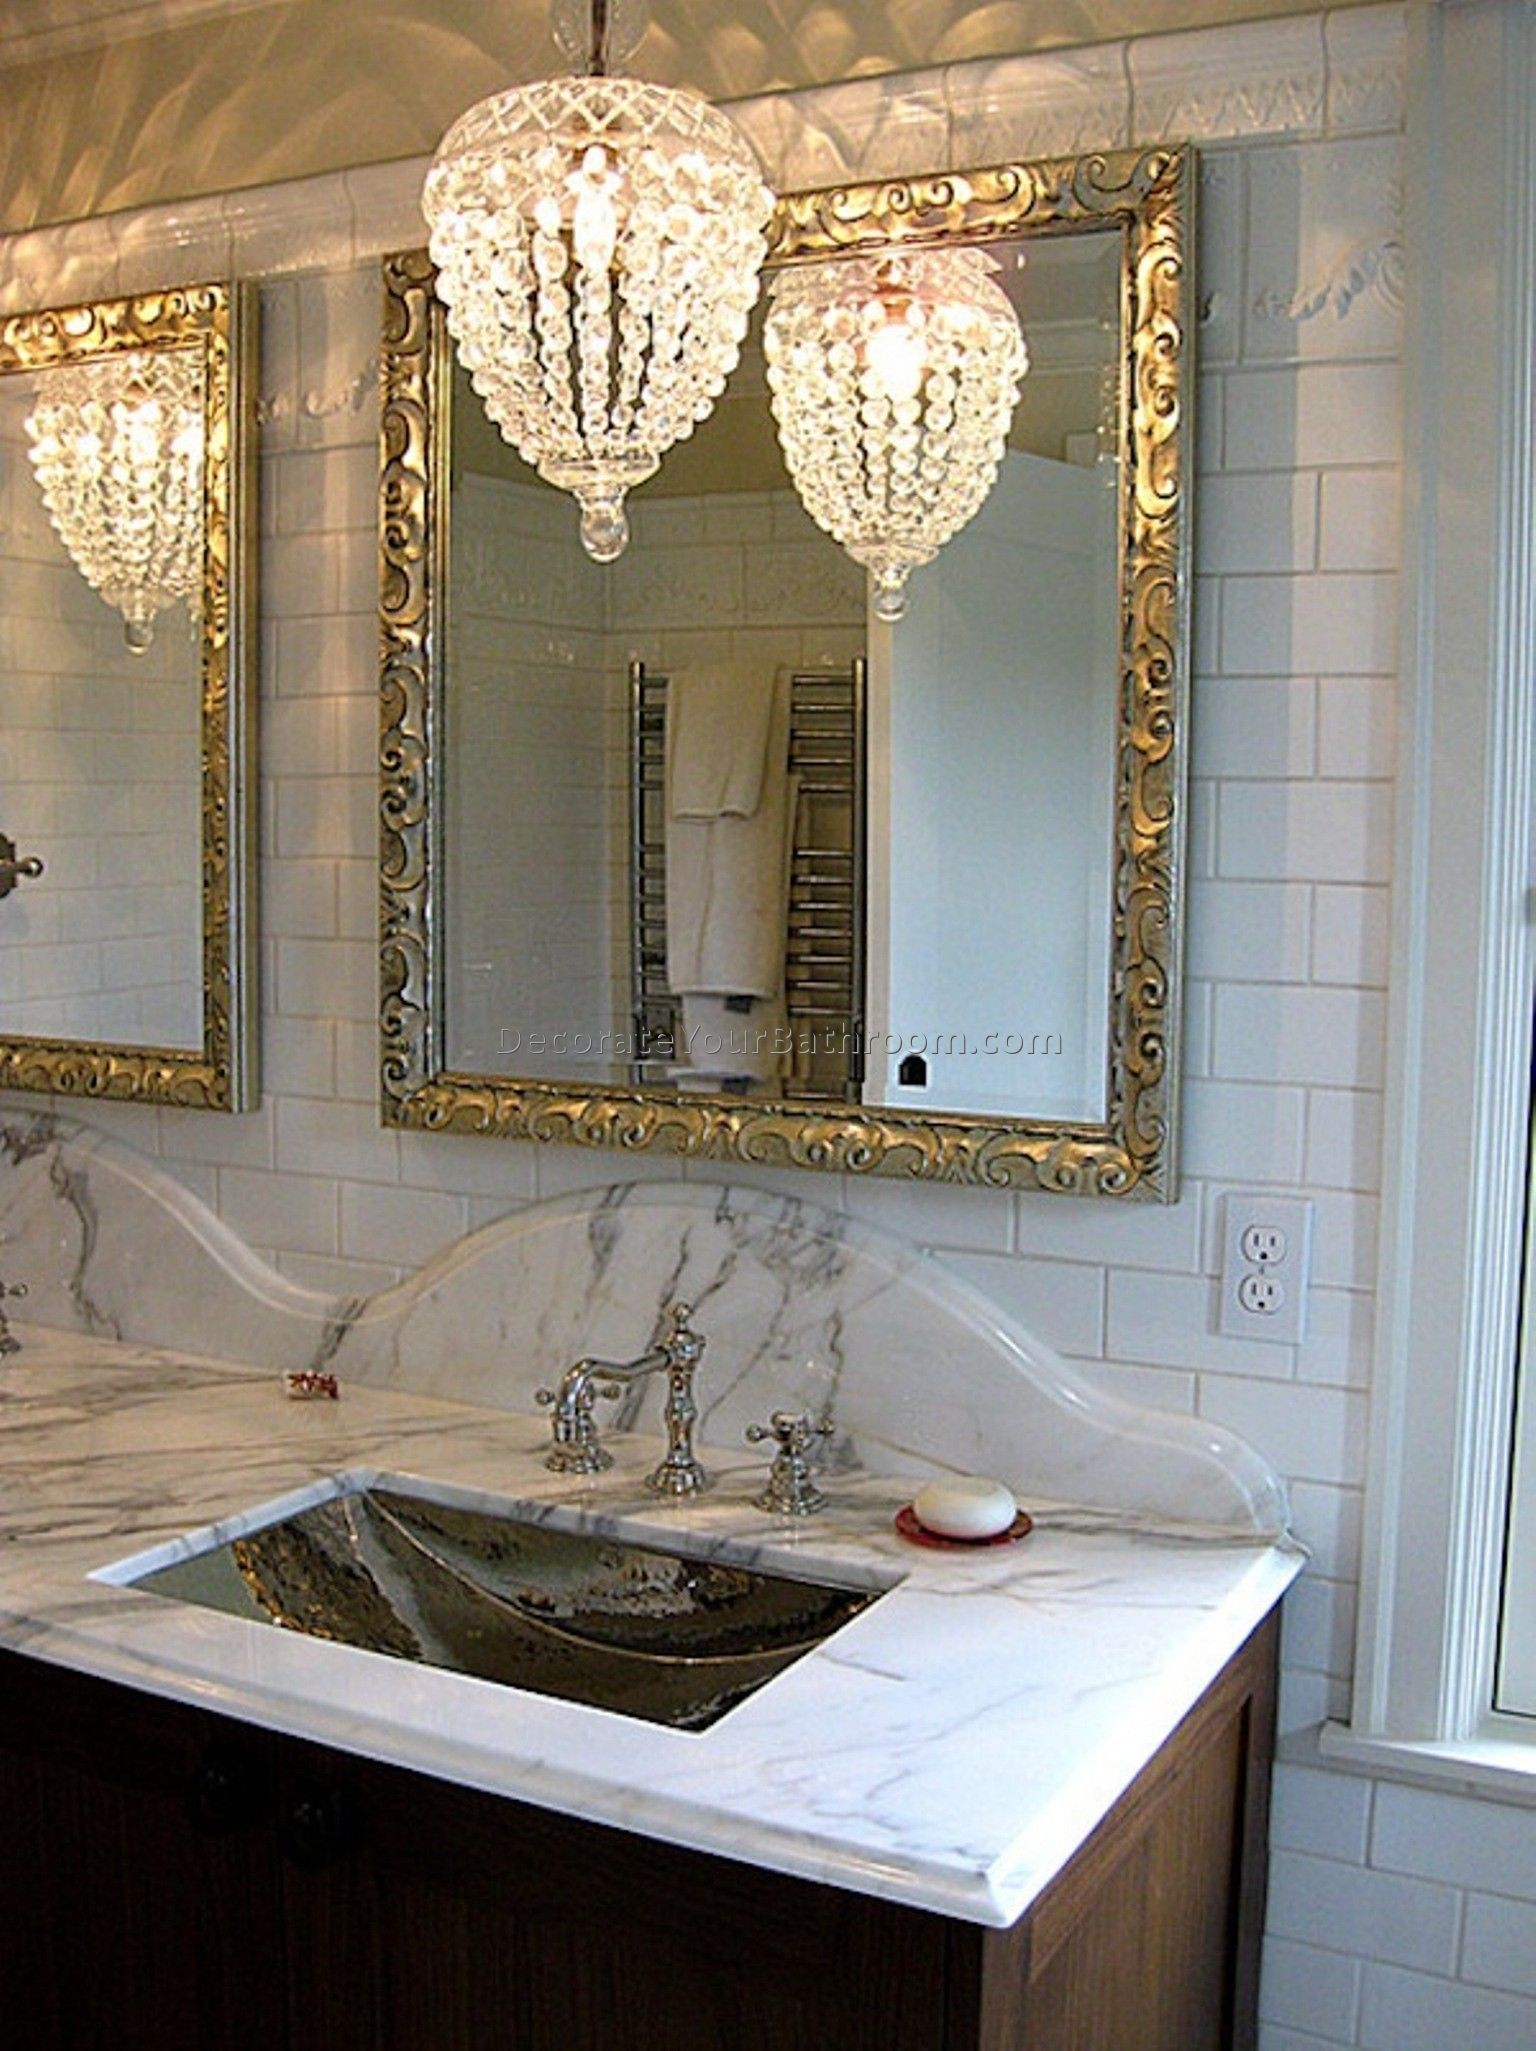 Small Chandelier For Bathroom Bathroom Chandelier Glamorous Bathroom Small Bathroom Chandelier